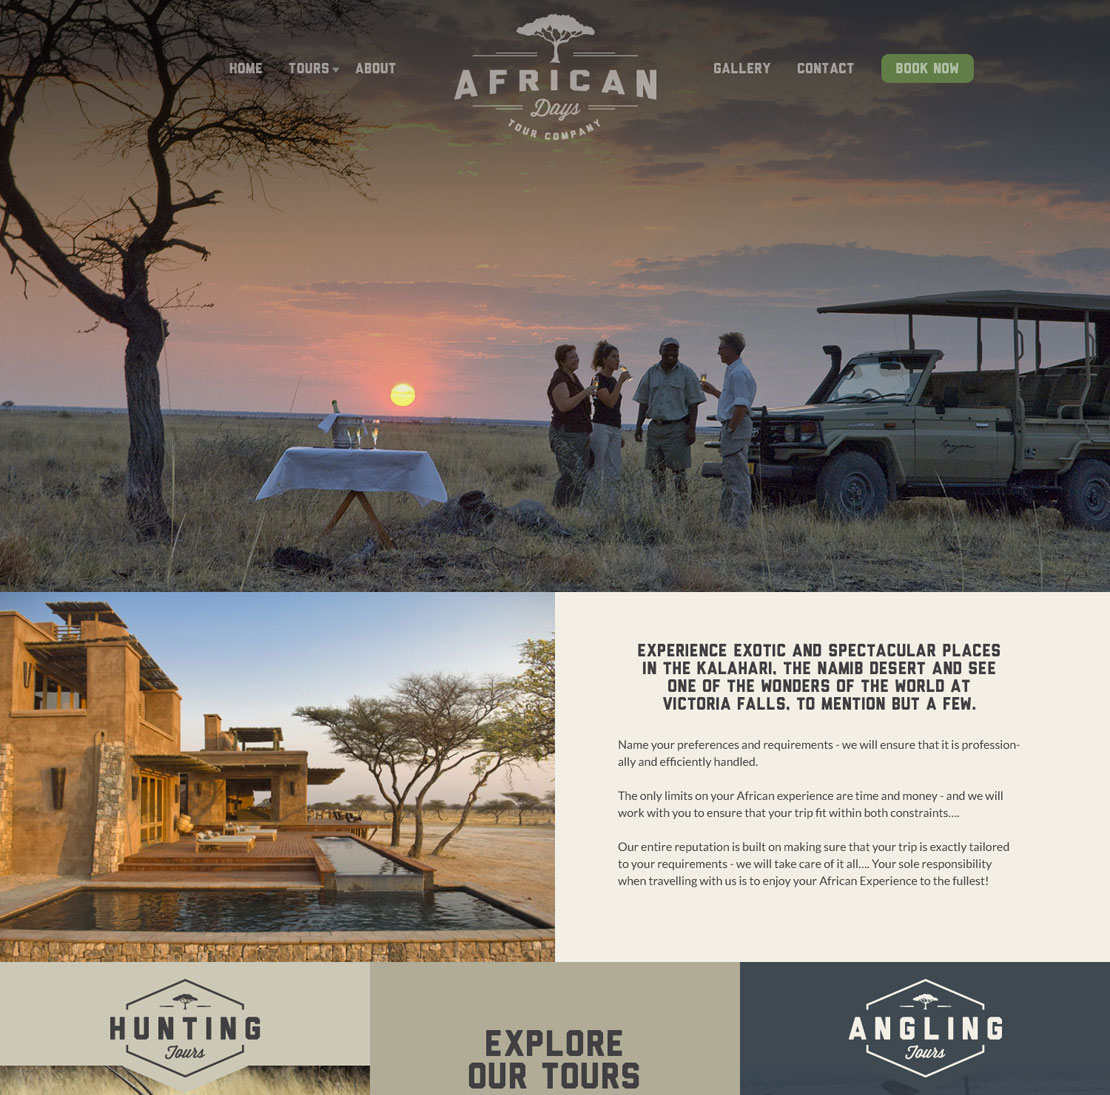 African Days